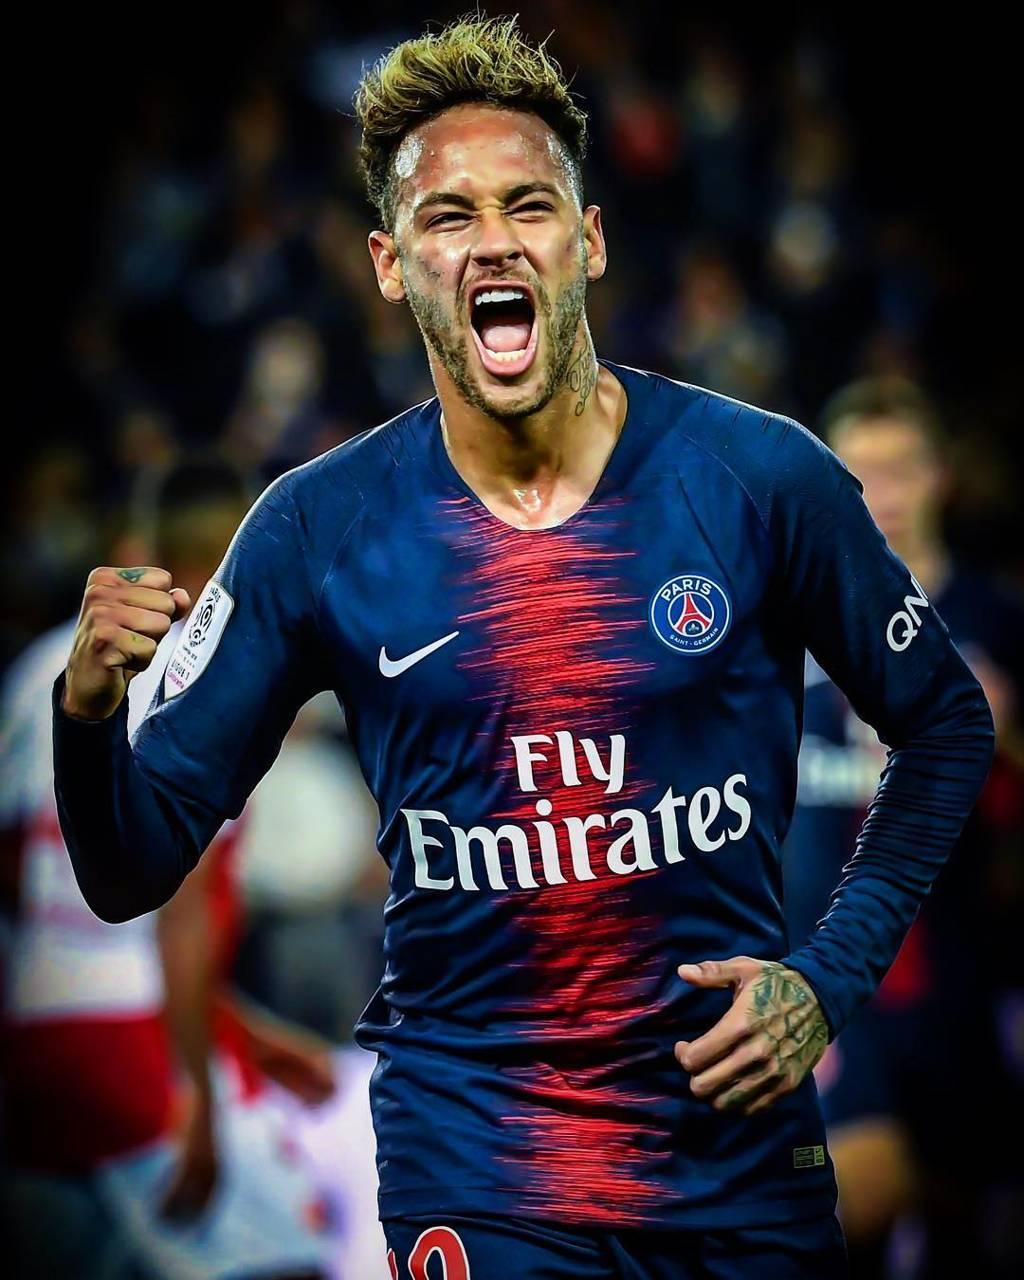 Neymar Jr Psg Wallpapers Top Free Neymar Jr Psg